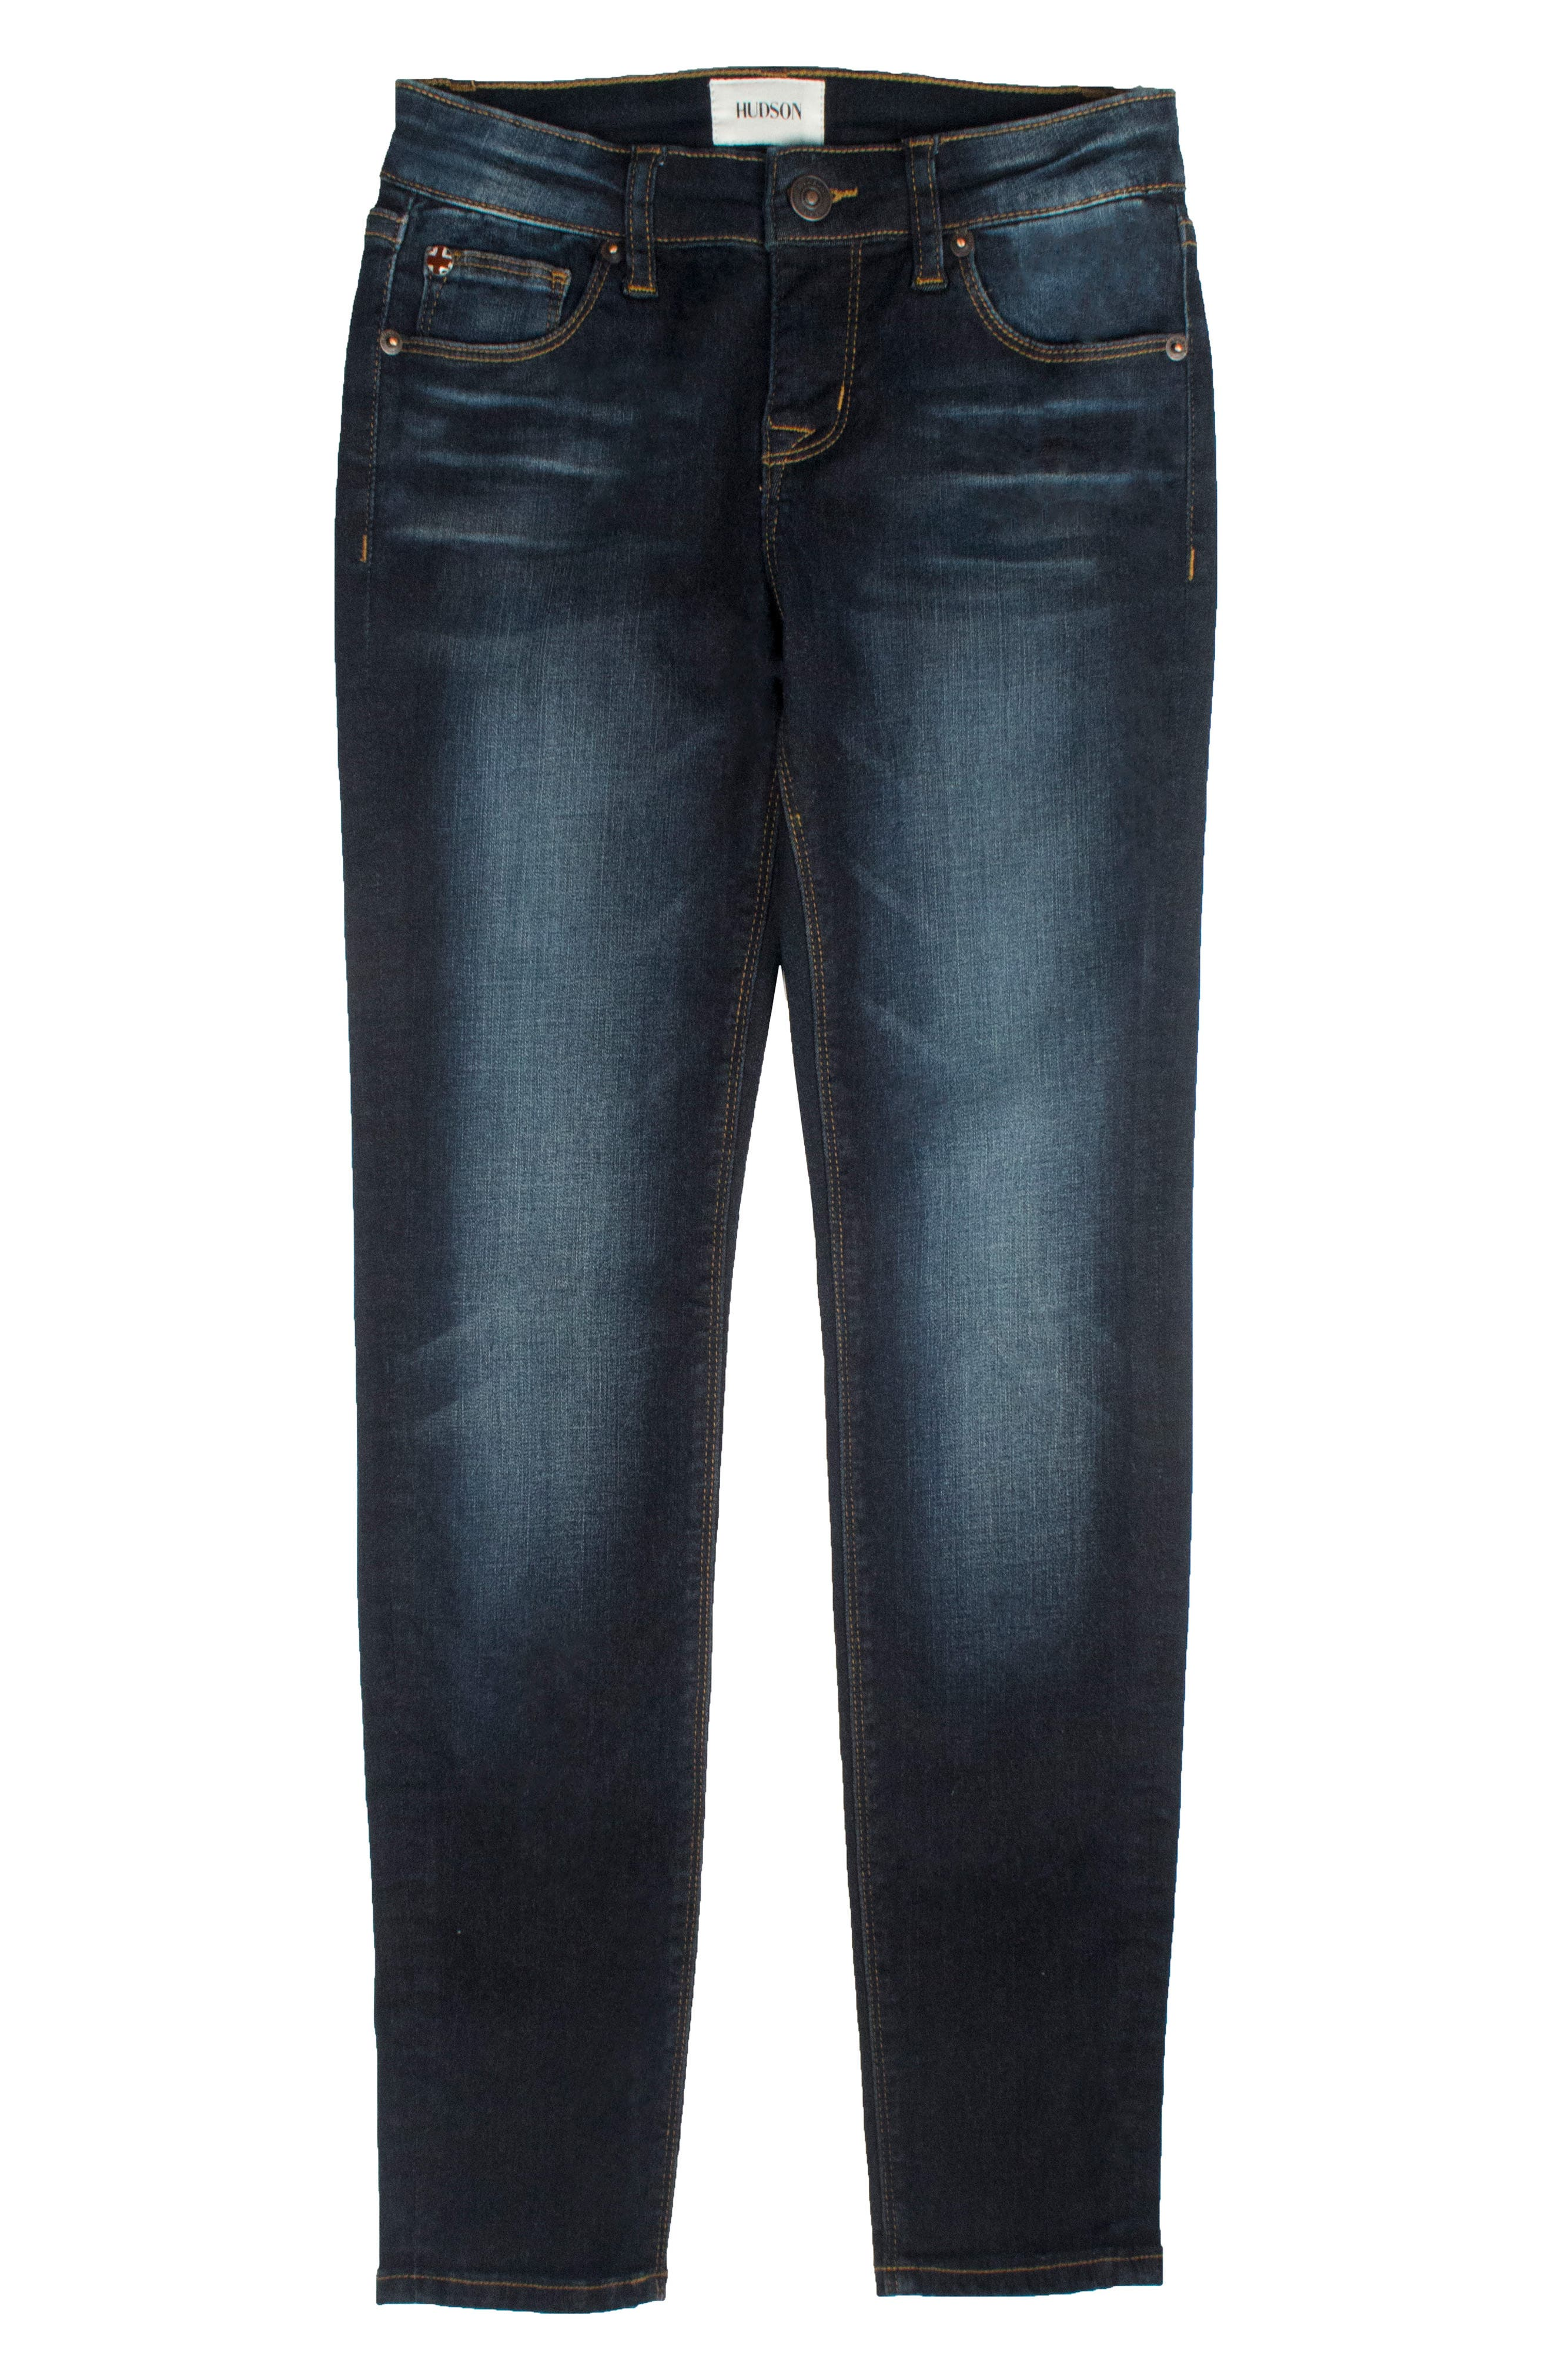 Christa Super Stretch Skinny Jeans,                         Main,                         color, Northern Light